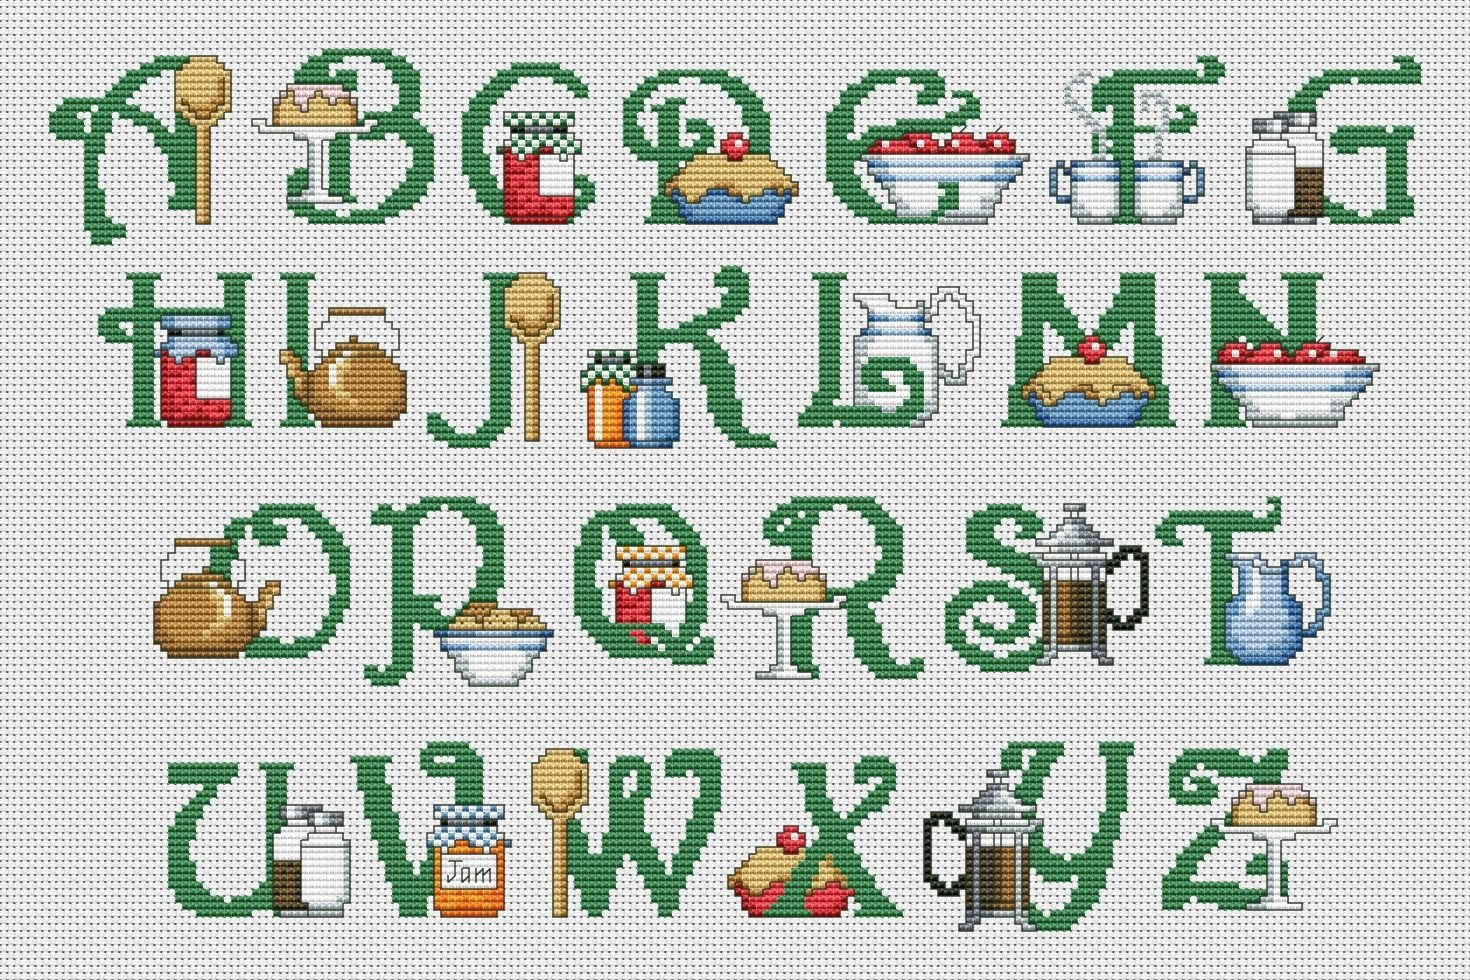 Kitchen Abc Cross Stitch Pattern Pdf Xsd Download